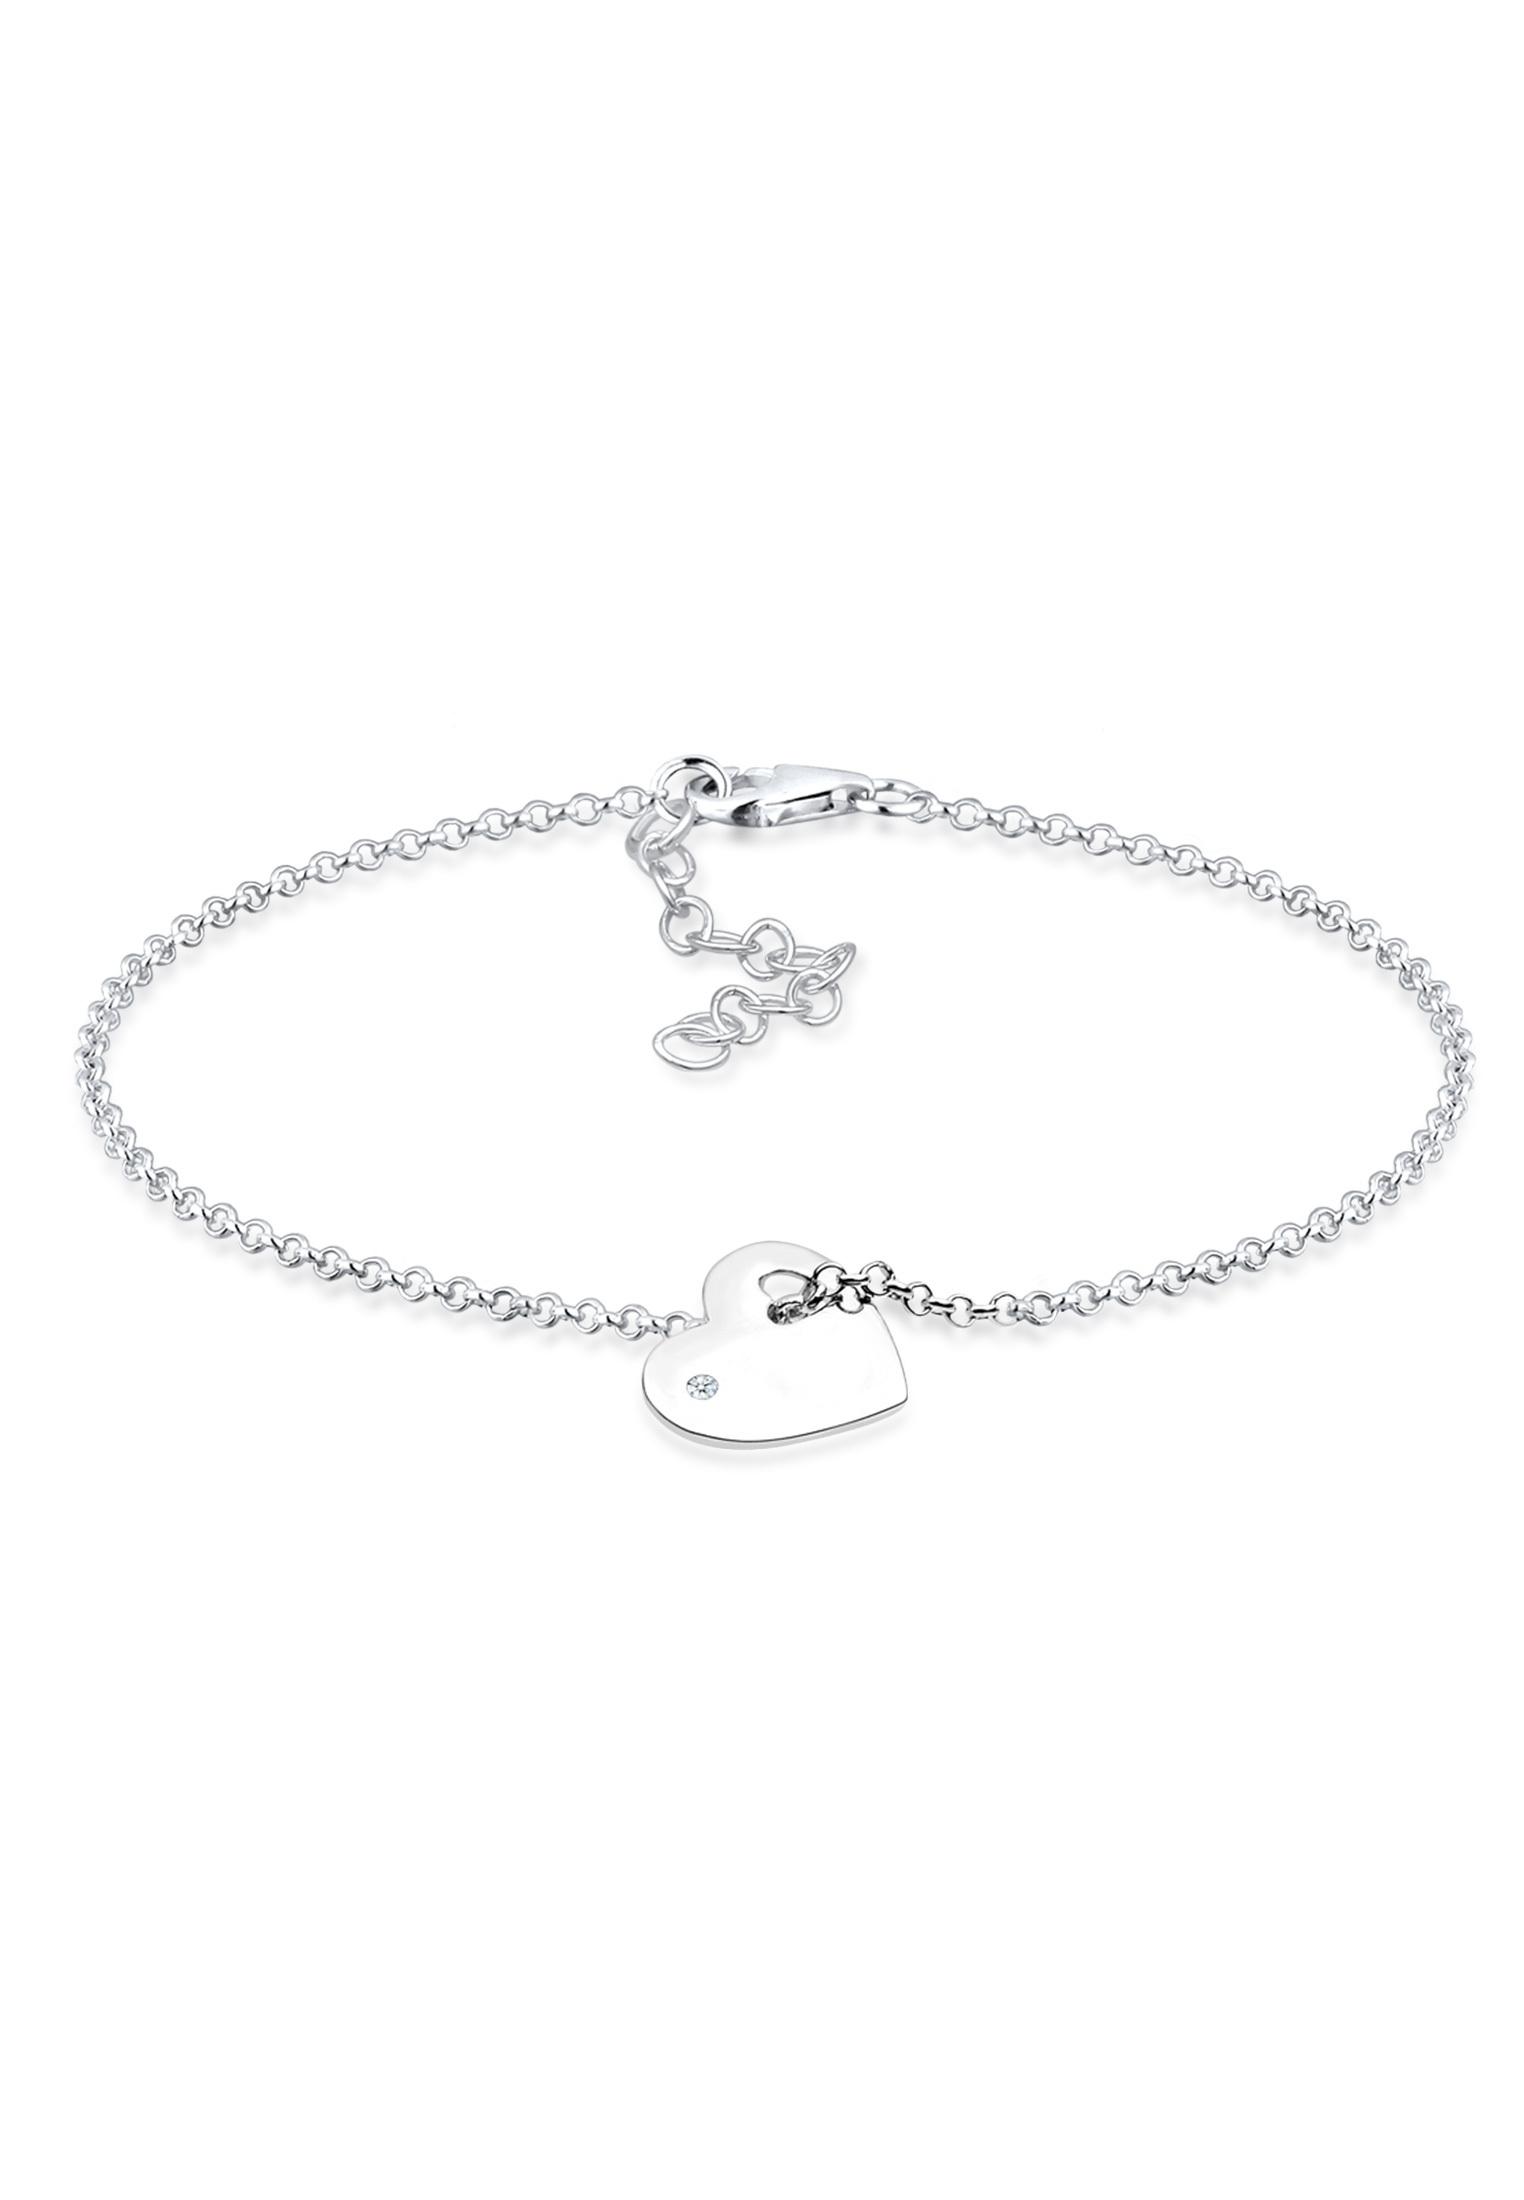 Armband Herz   Diamant ( Weiß, 0,015 ct )   925er Sterling Silber